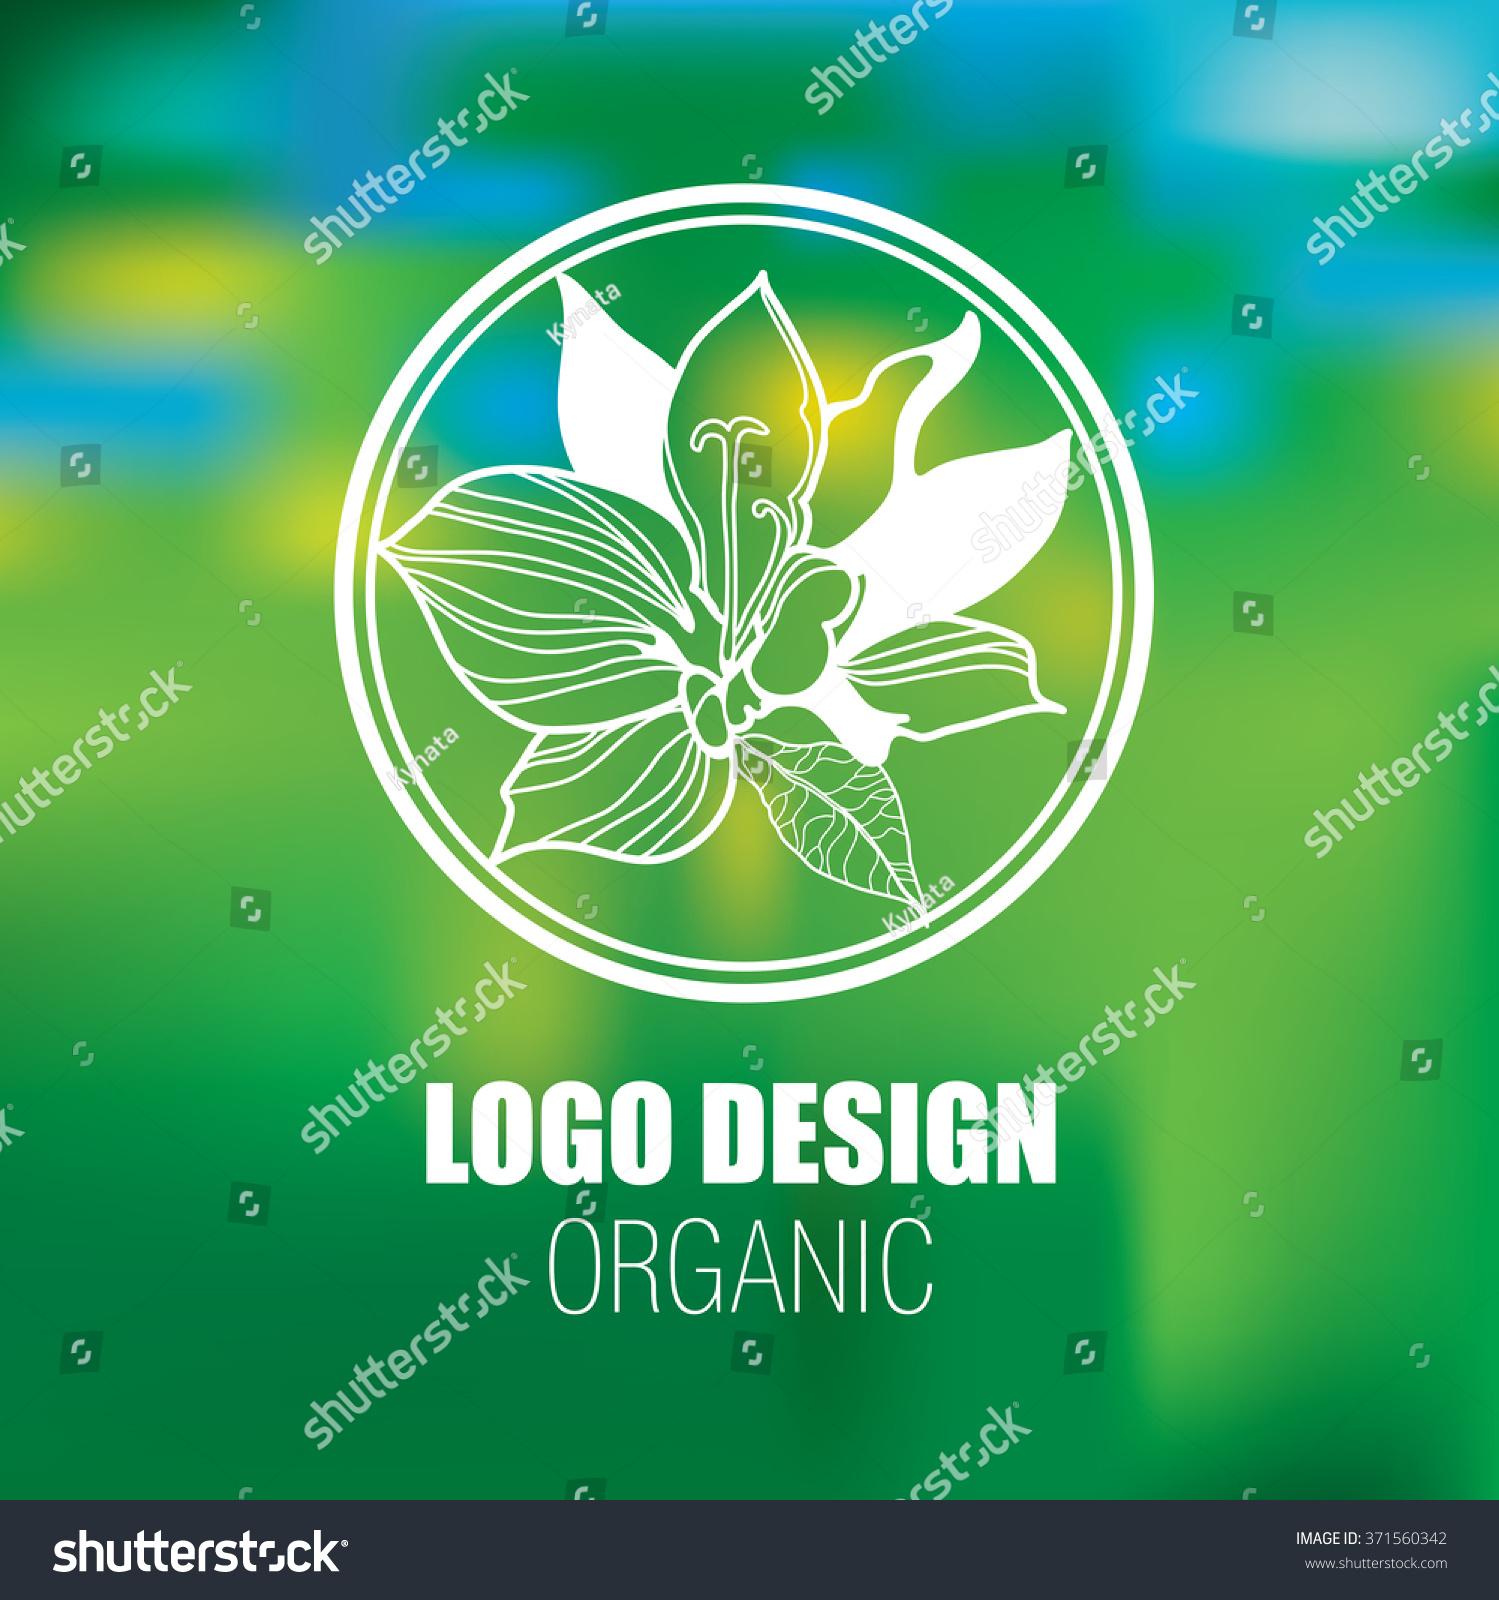 Vector Design Elements Organic Natural Logos Stock Vector